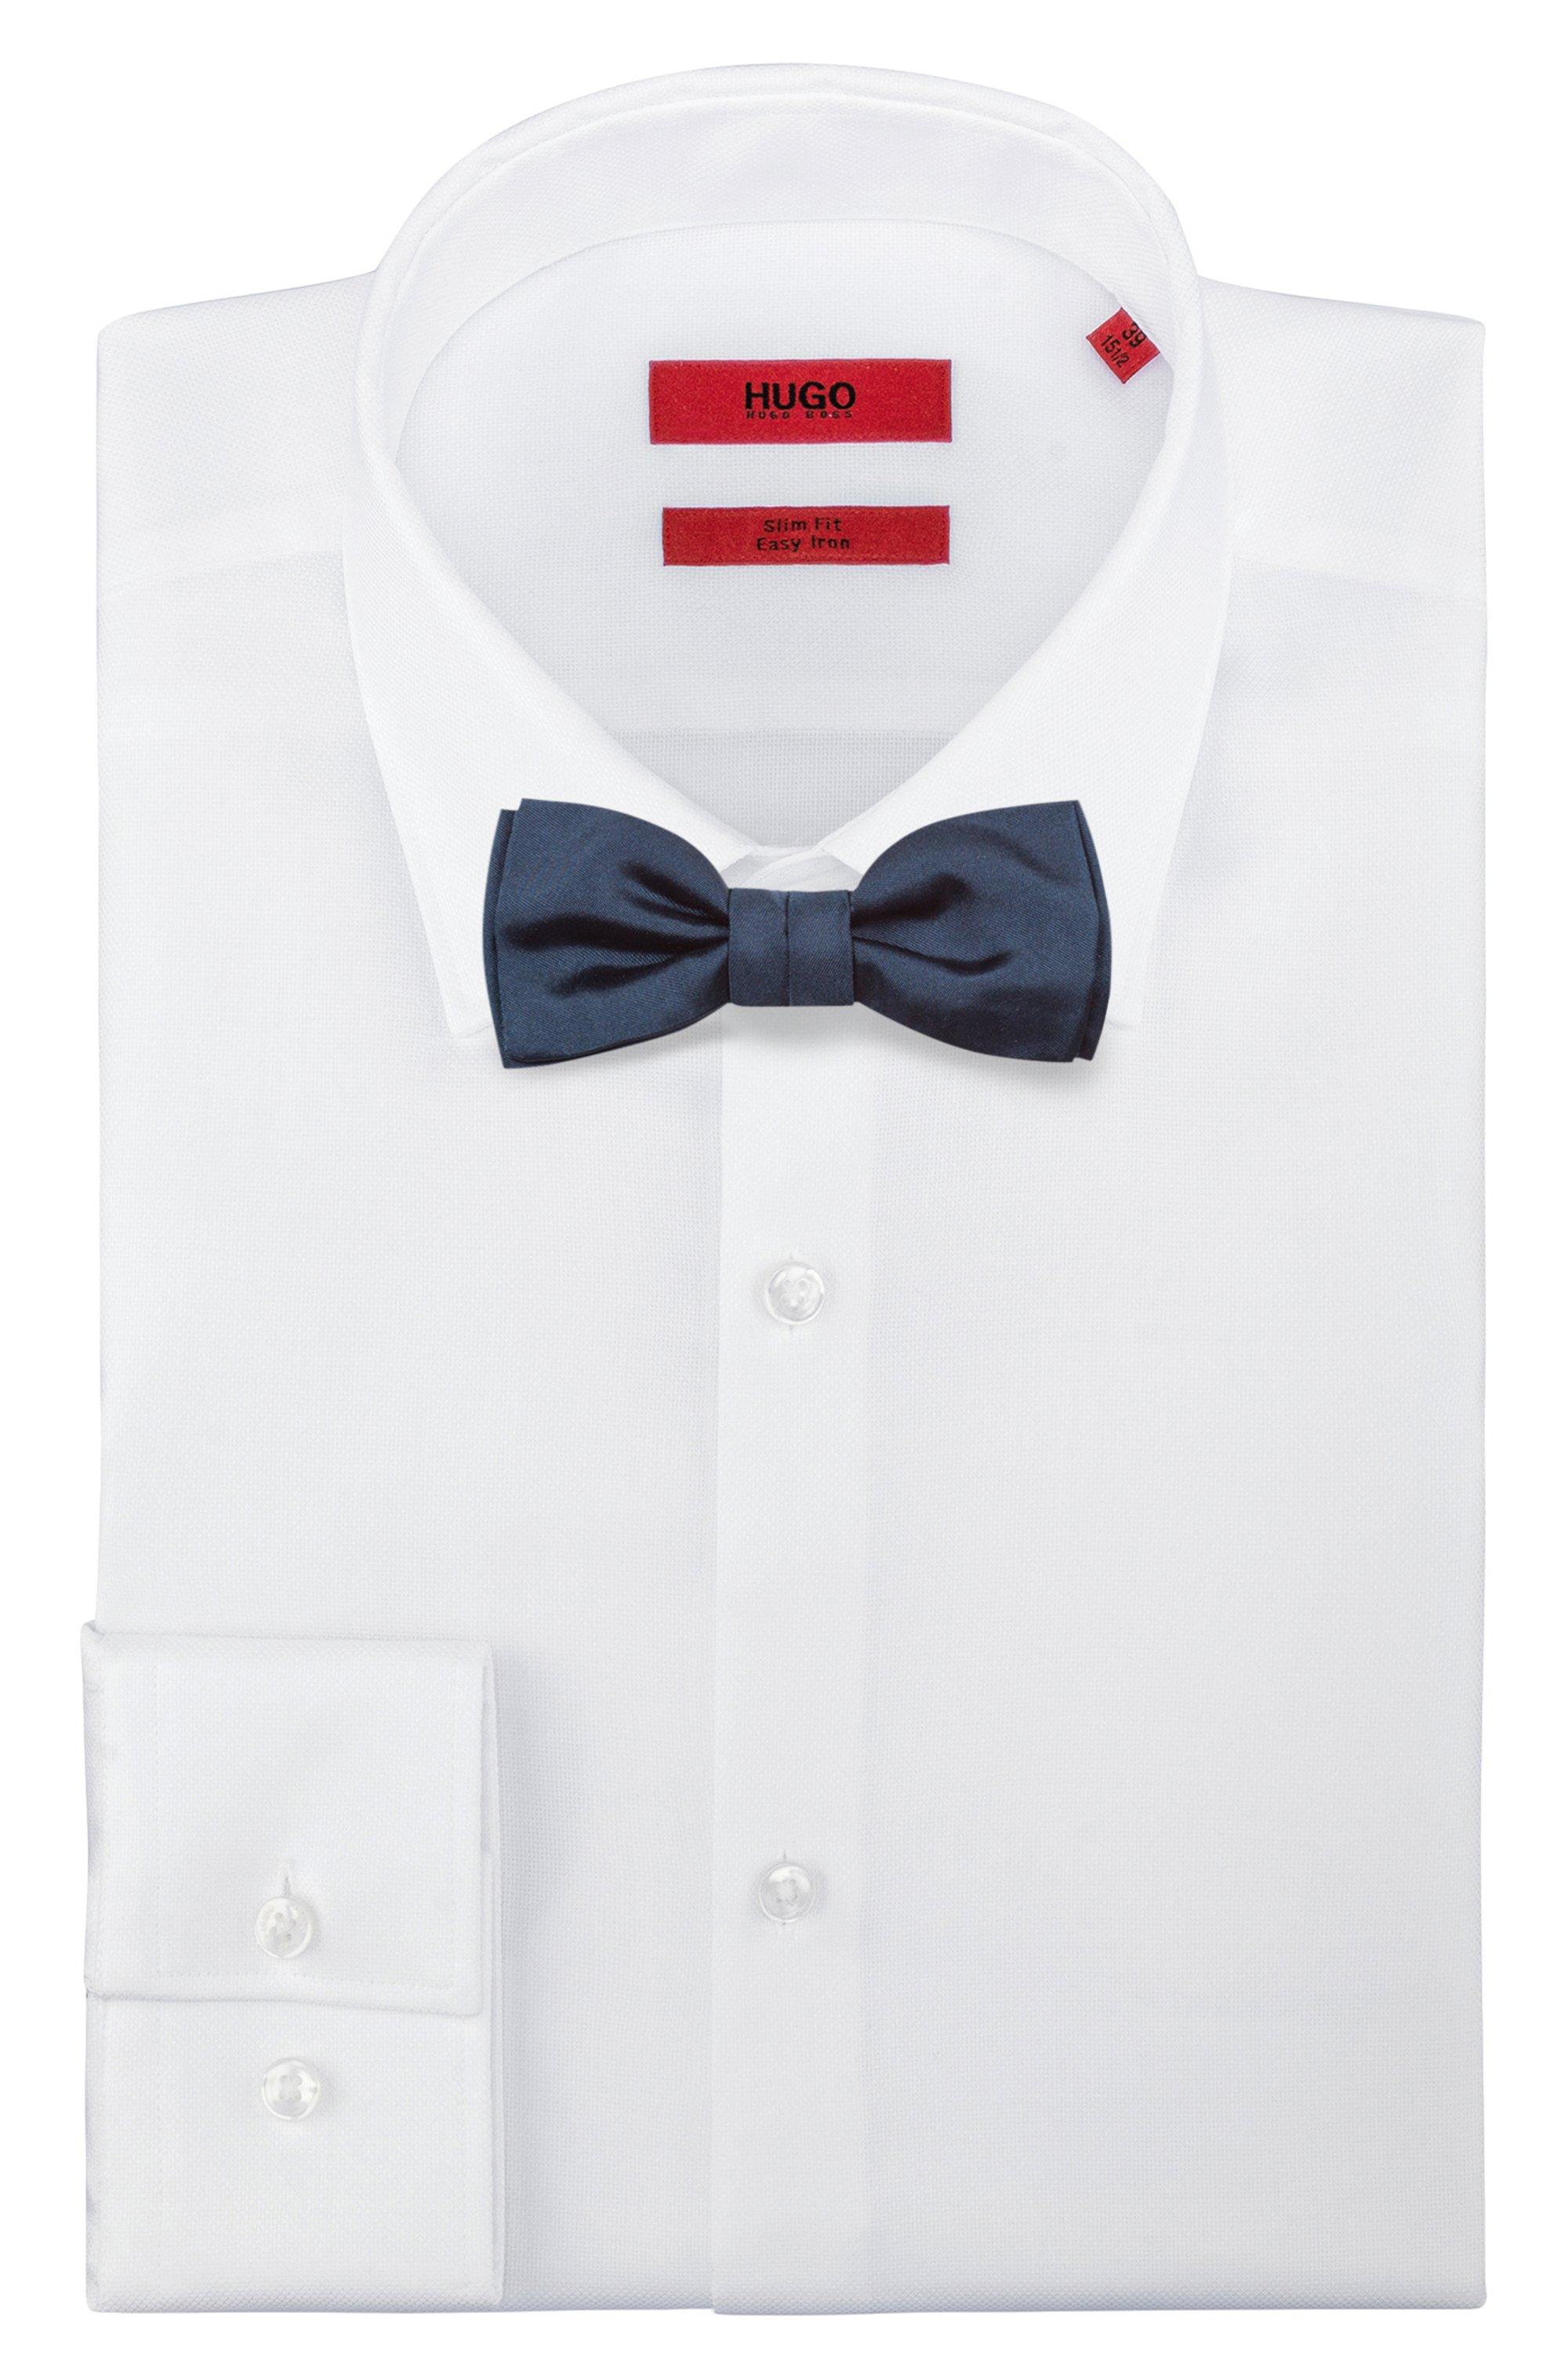 Satin bow tie in silk jacquard